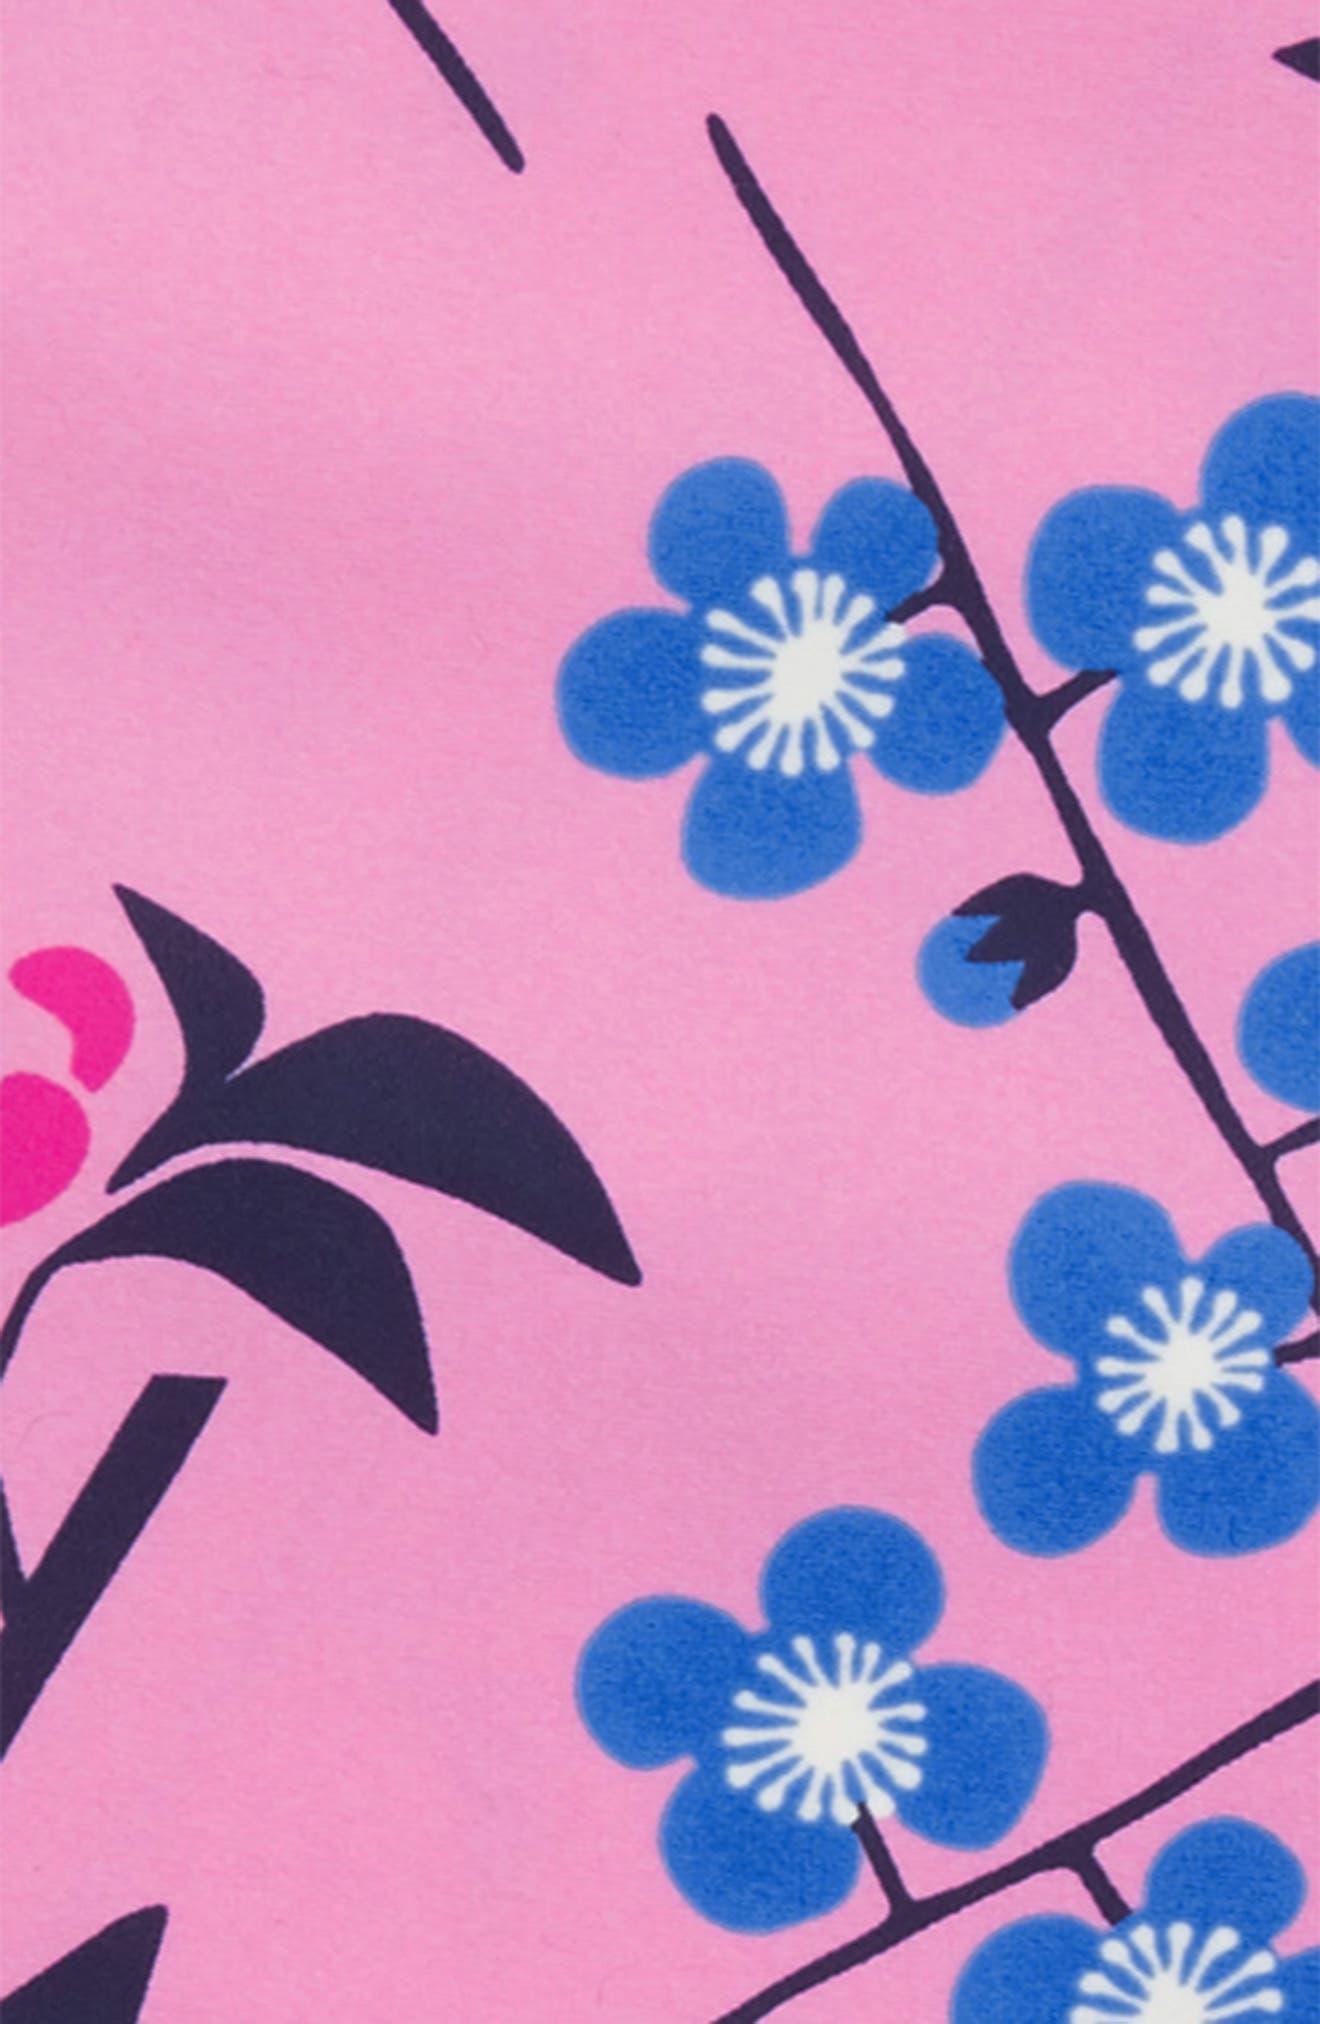 Mixed Print Two-Piece Rashguard Swimsuit,                             Alternate thumbnail 2, color,                             Branch Blossoms